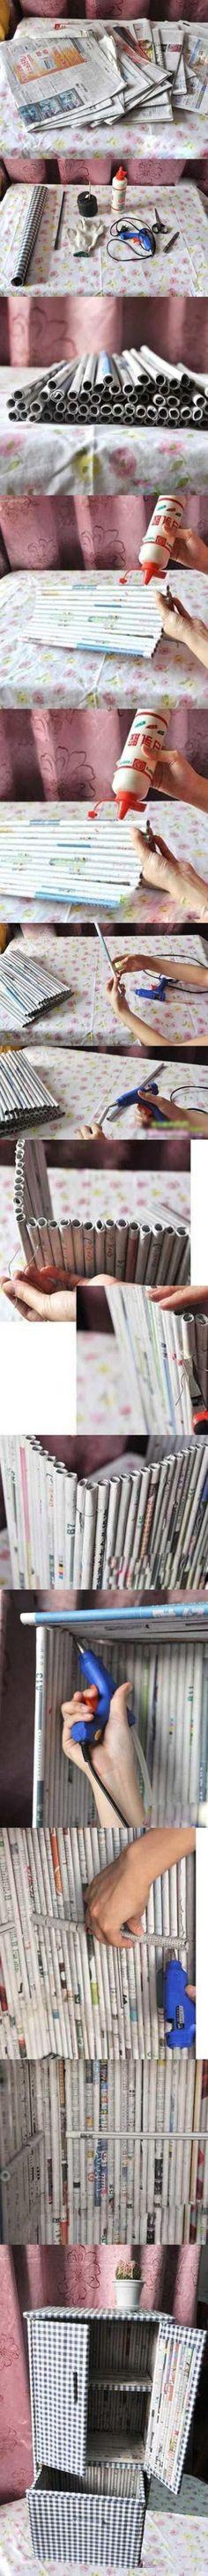 Reuse the newspapers | DIY real